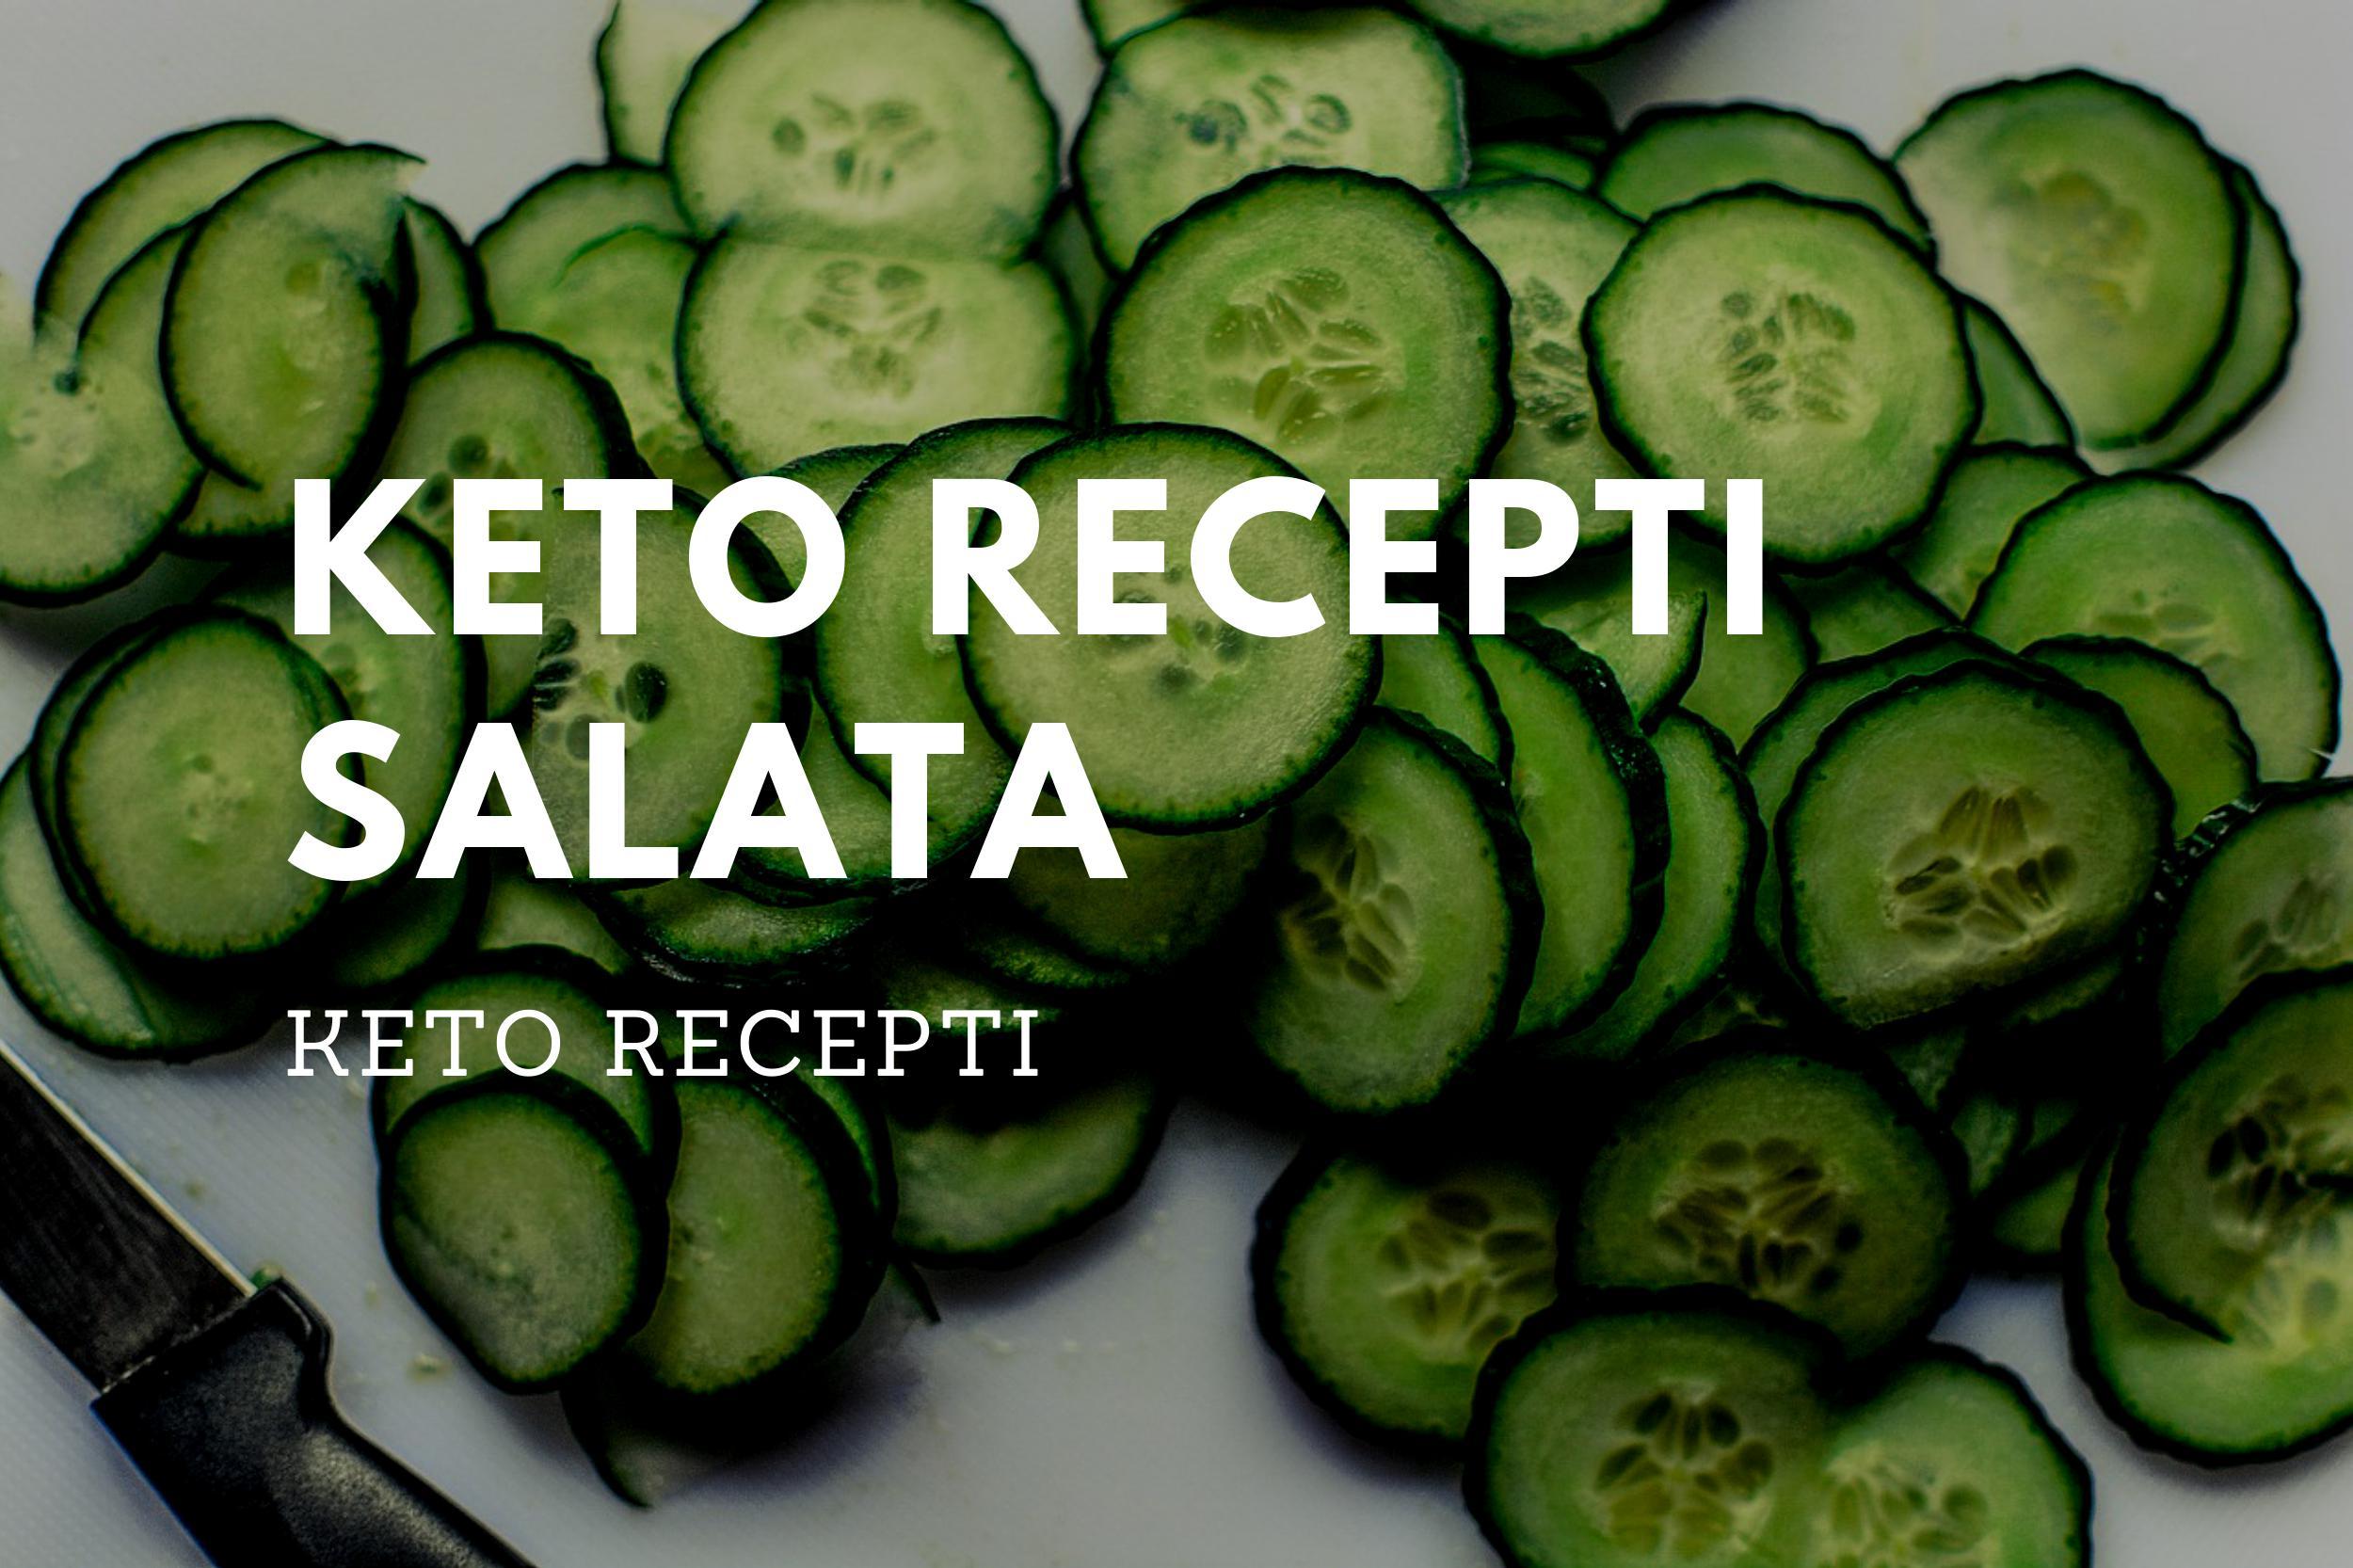 keto recepti salata